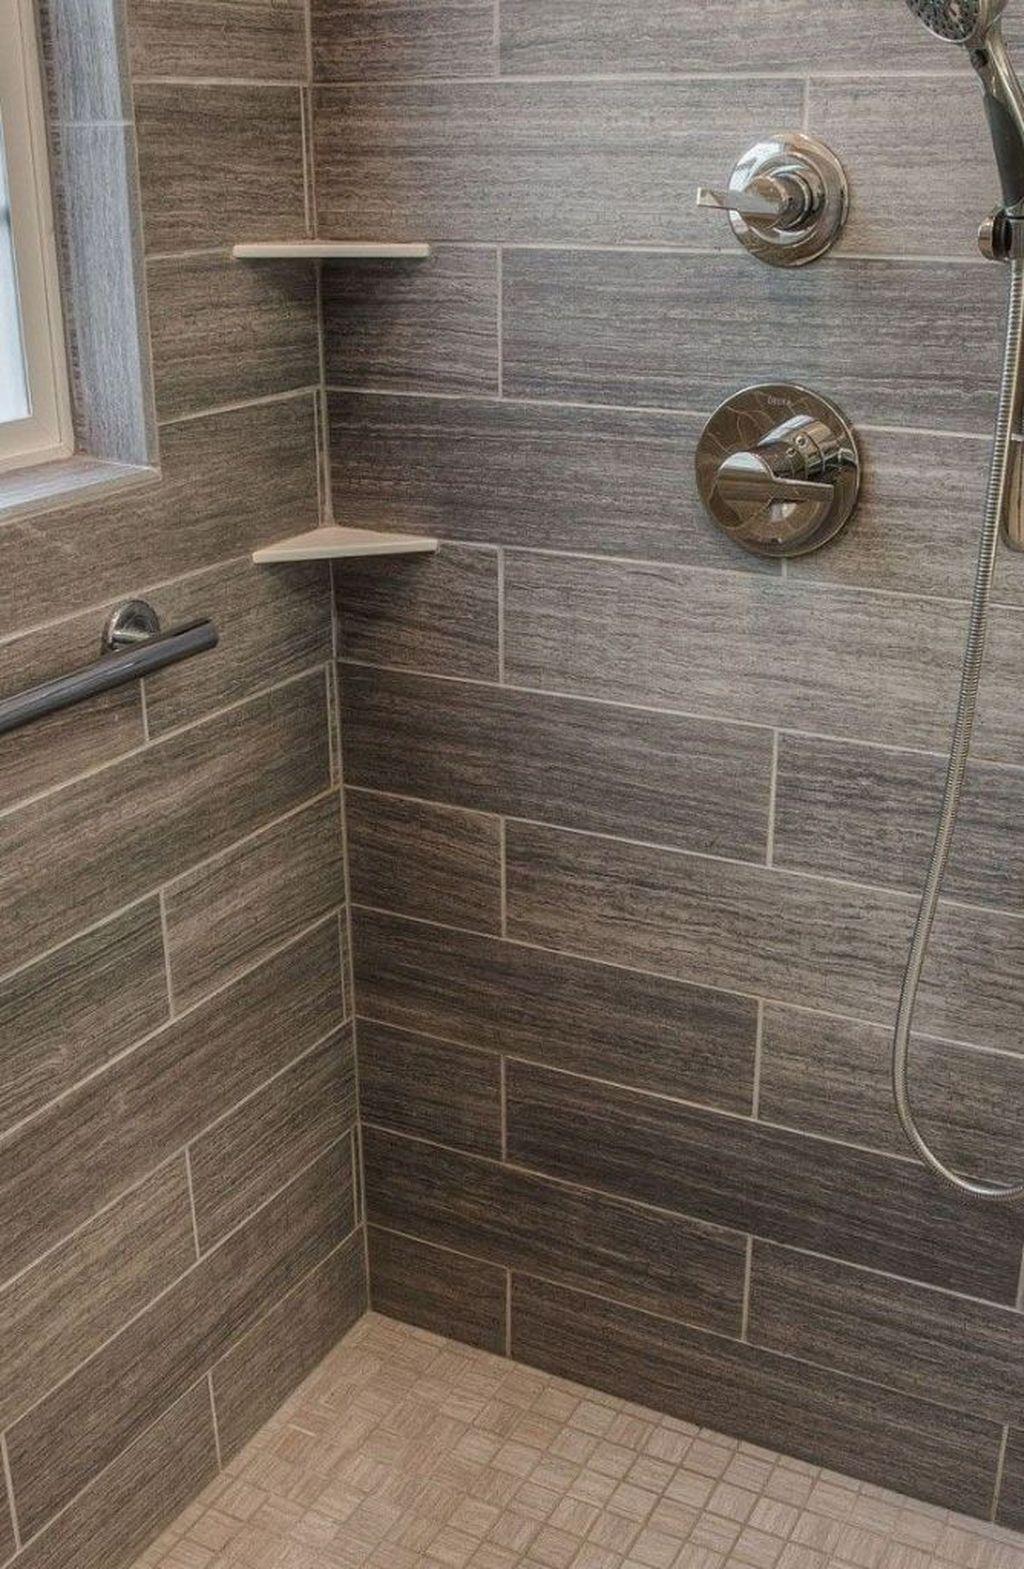 30 Flawless Bathroom Ceramics Design Ideas For Your Inspiration In 2020 Rustic Bathroom Shower Bathroom Shower Tile Shower Tile